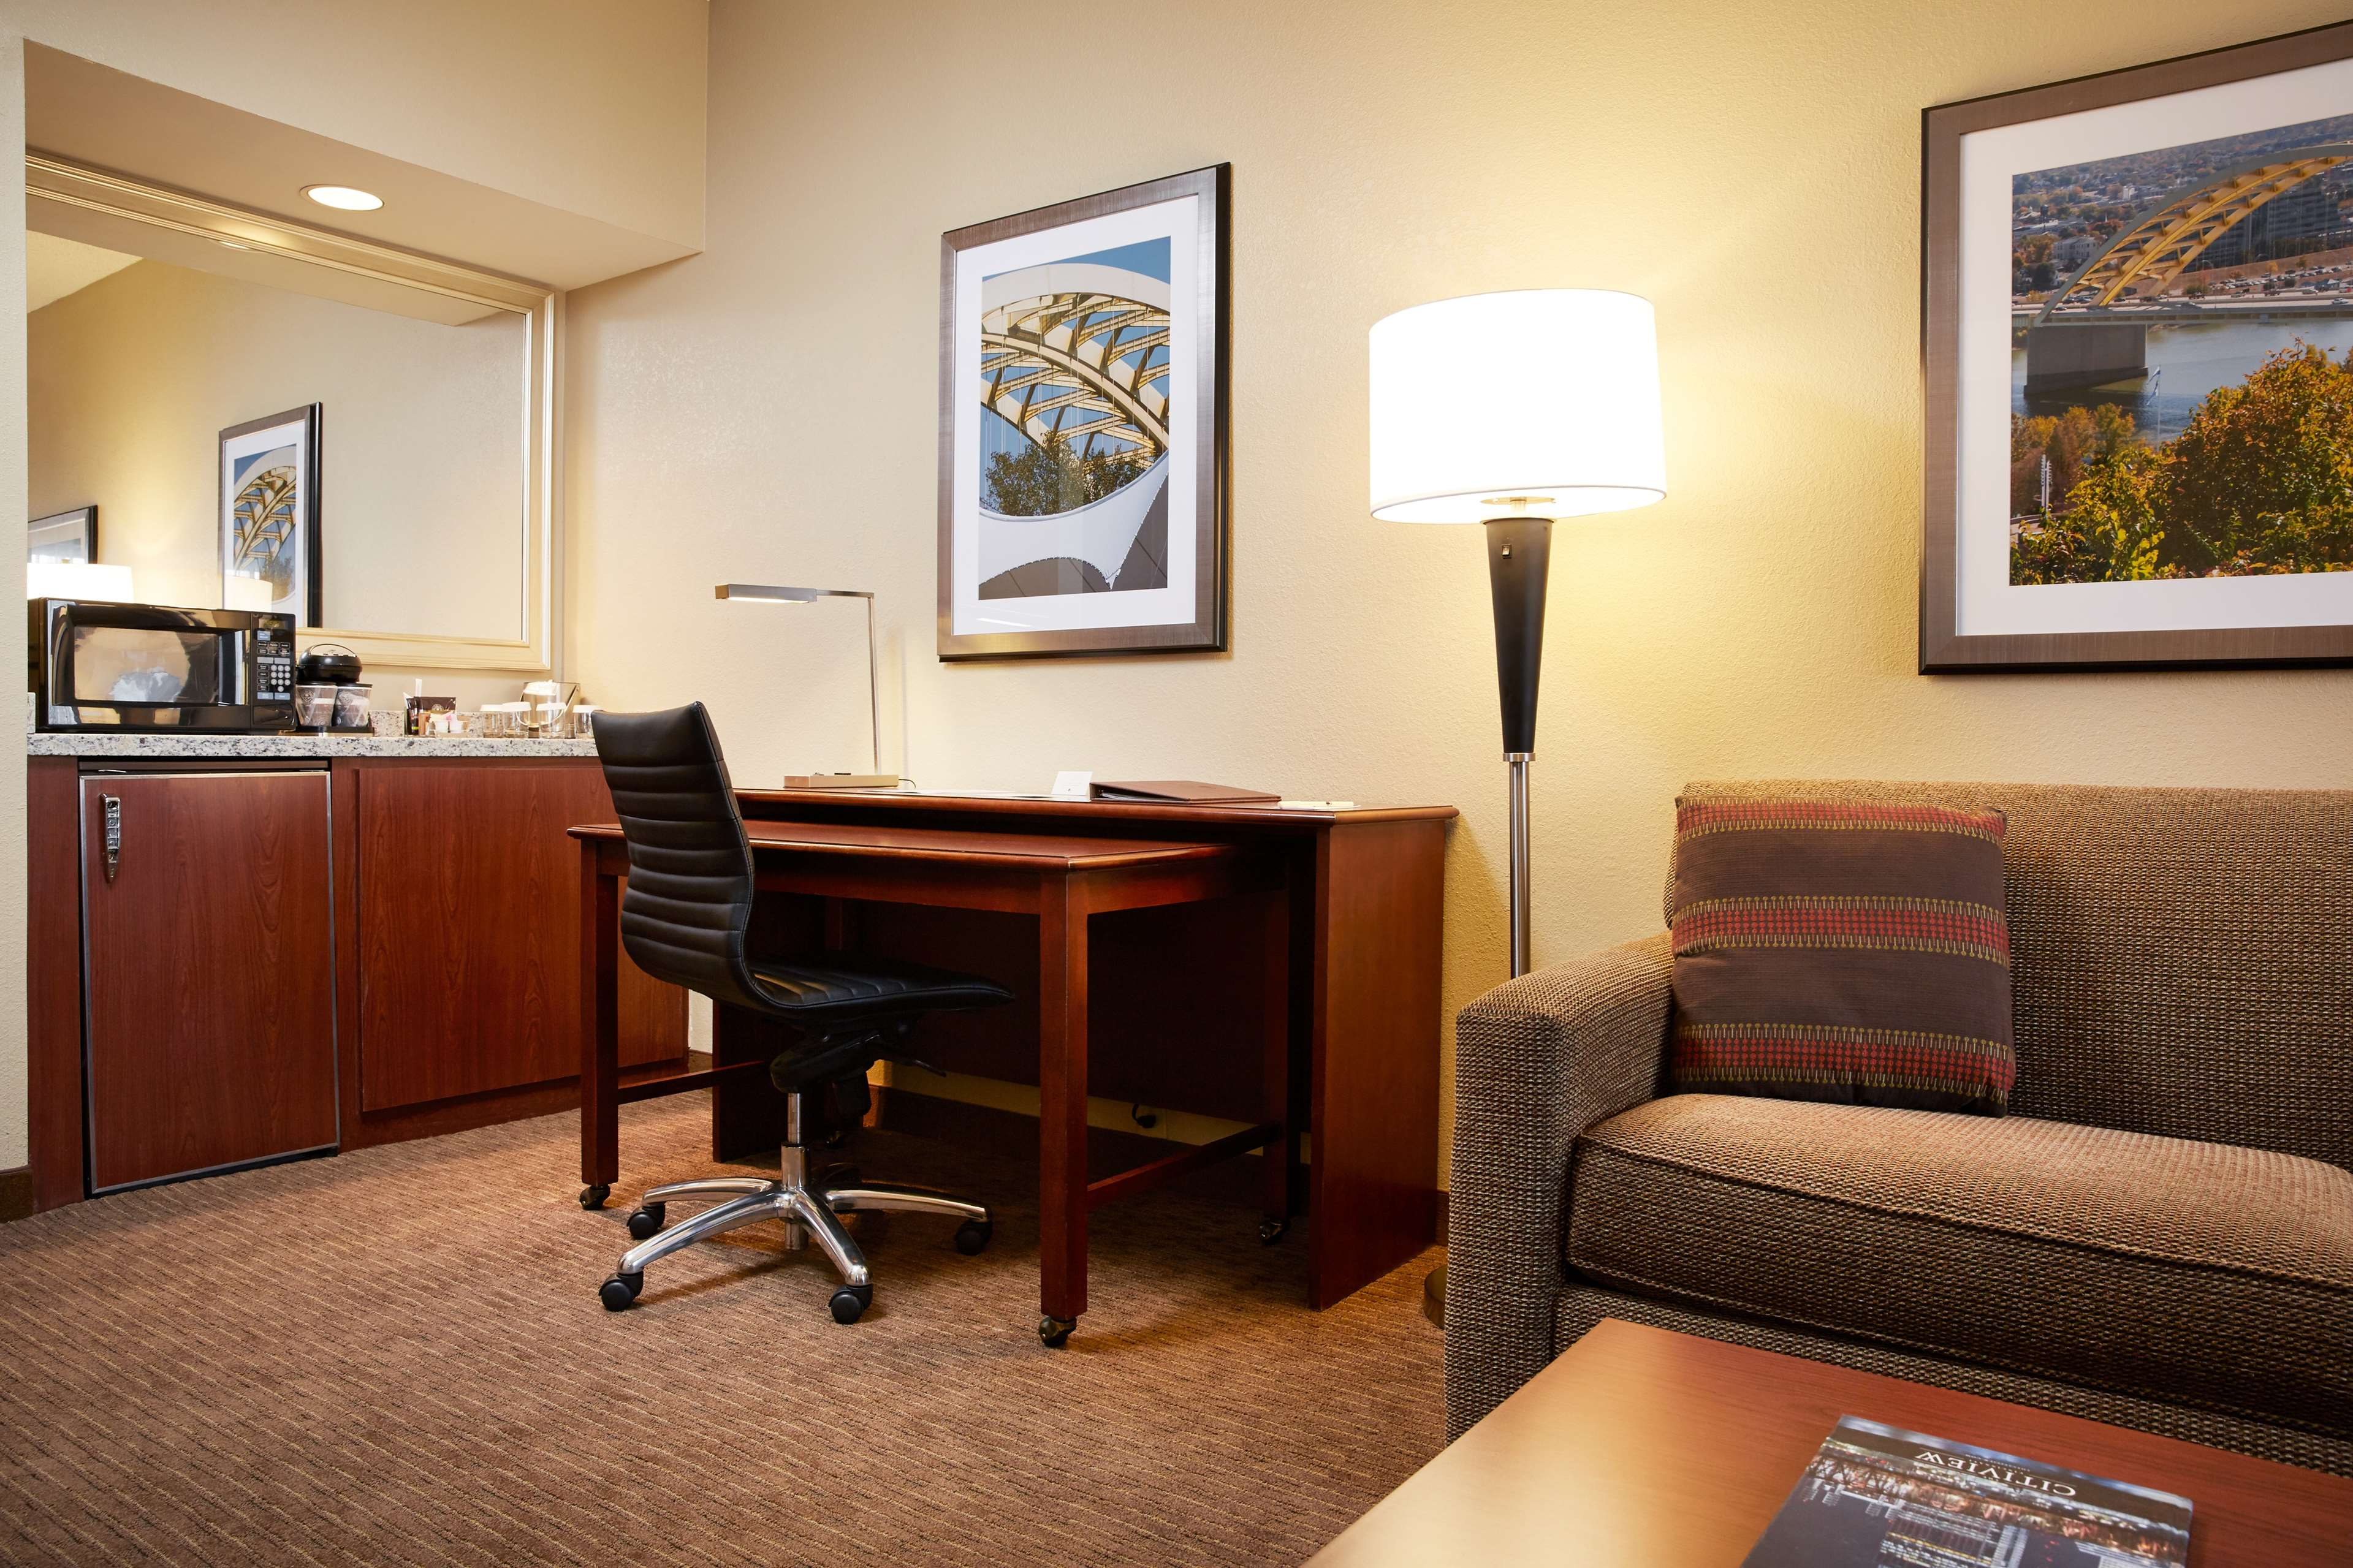 DoubleTree Suites by Hilton Hotel Cincinnati - Blue Ash image 11